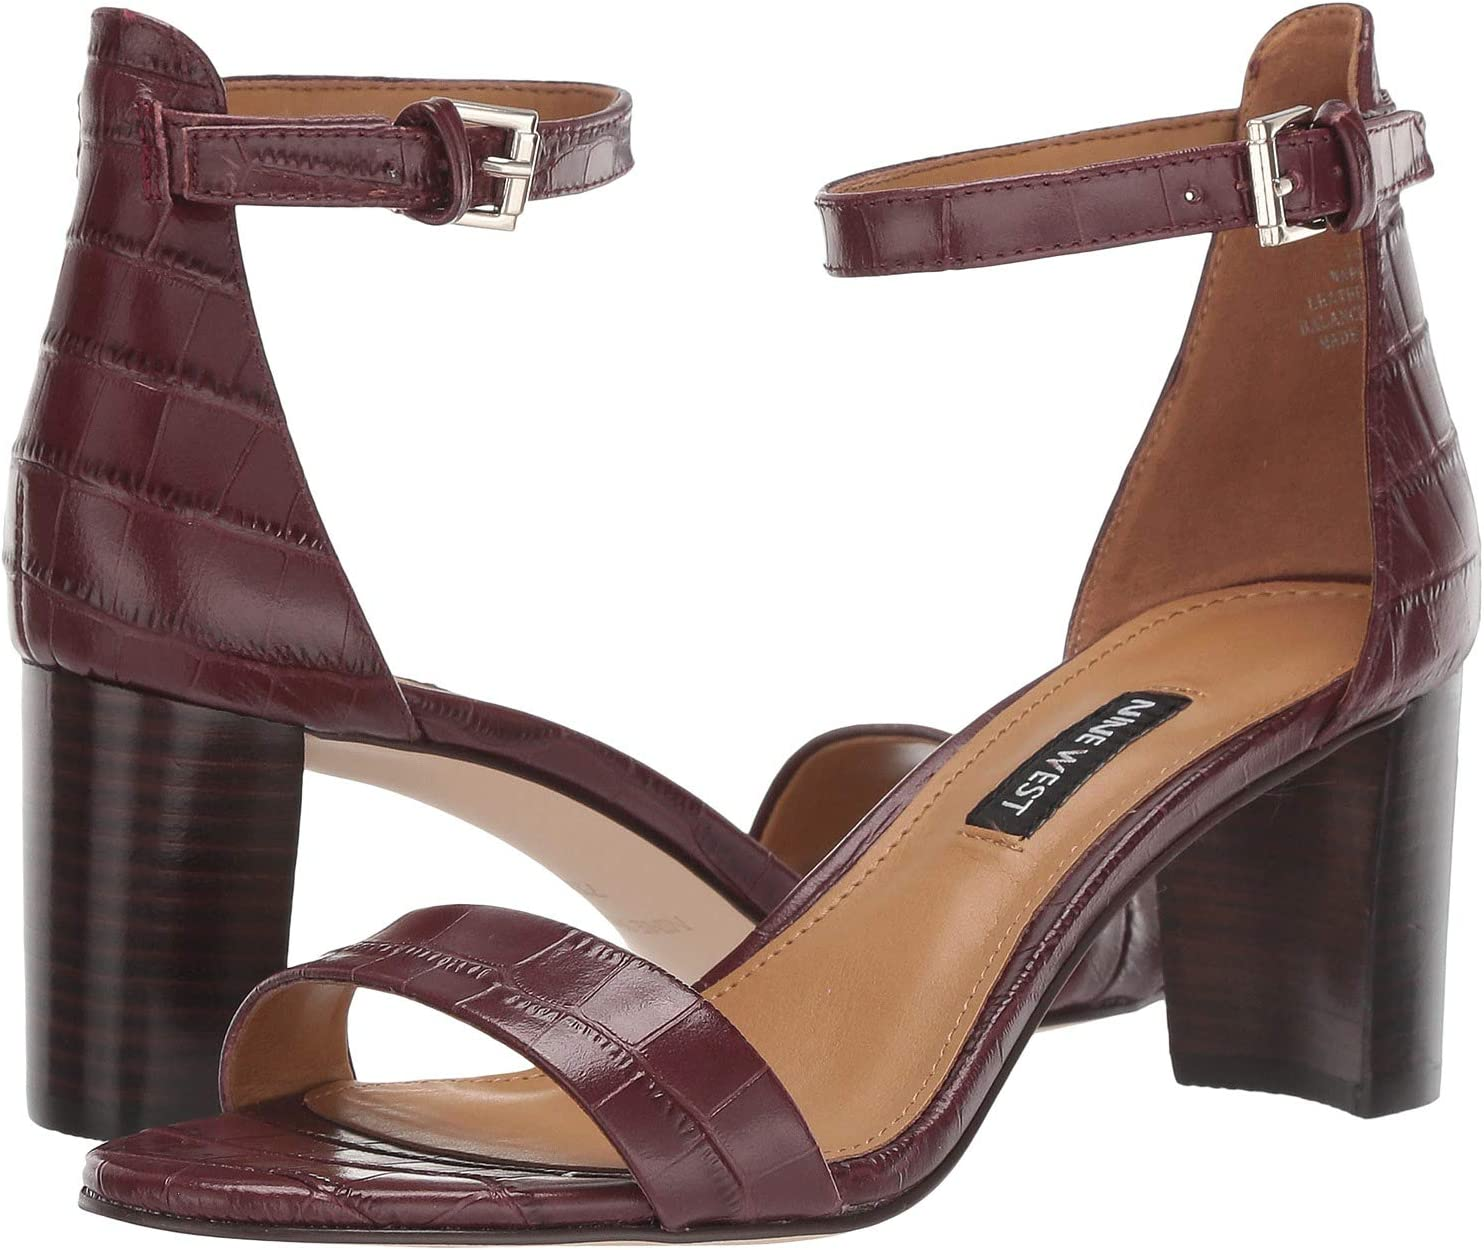 TC-3-Sandals-2019-10-07